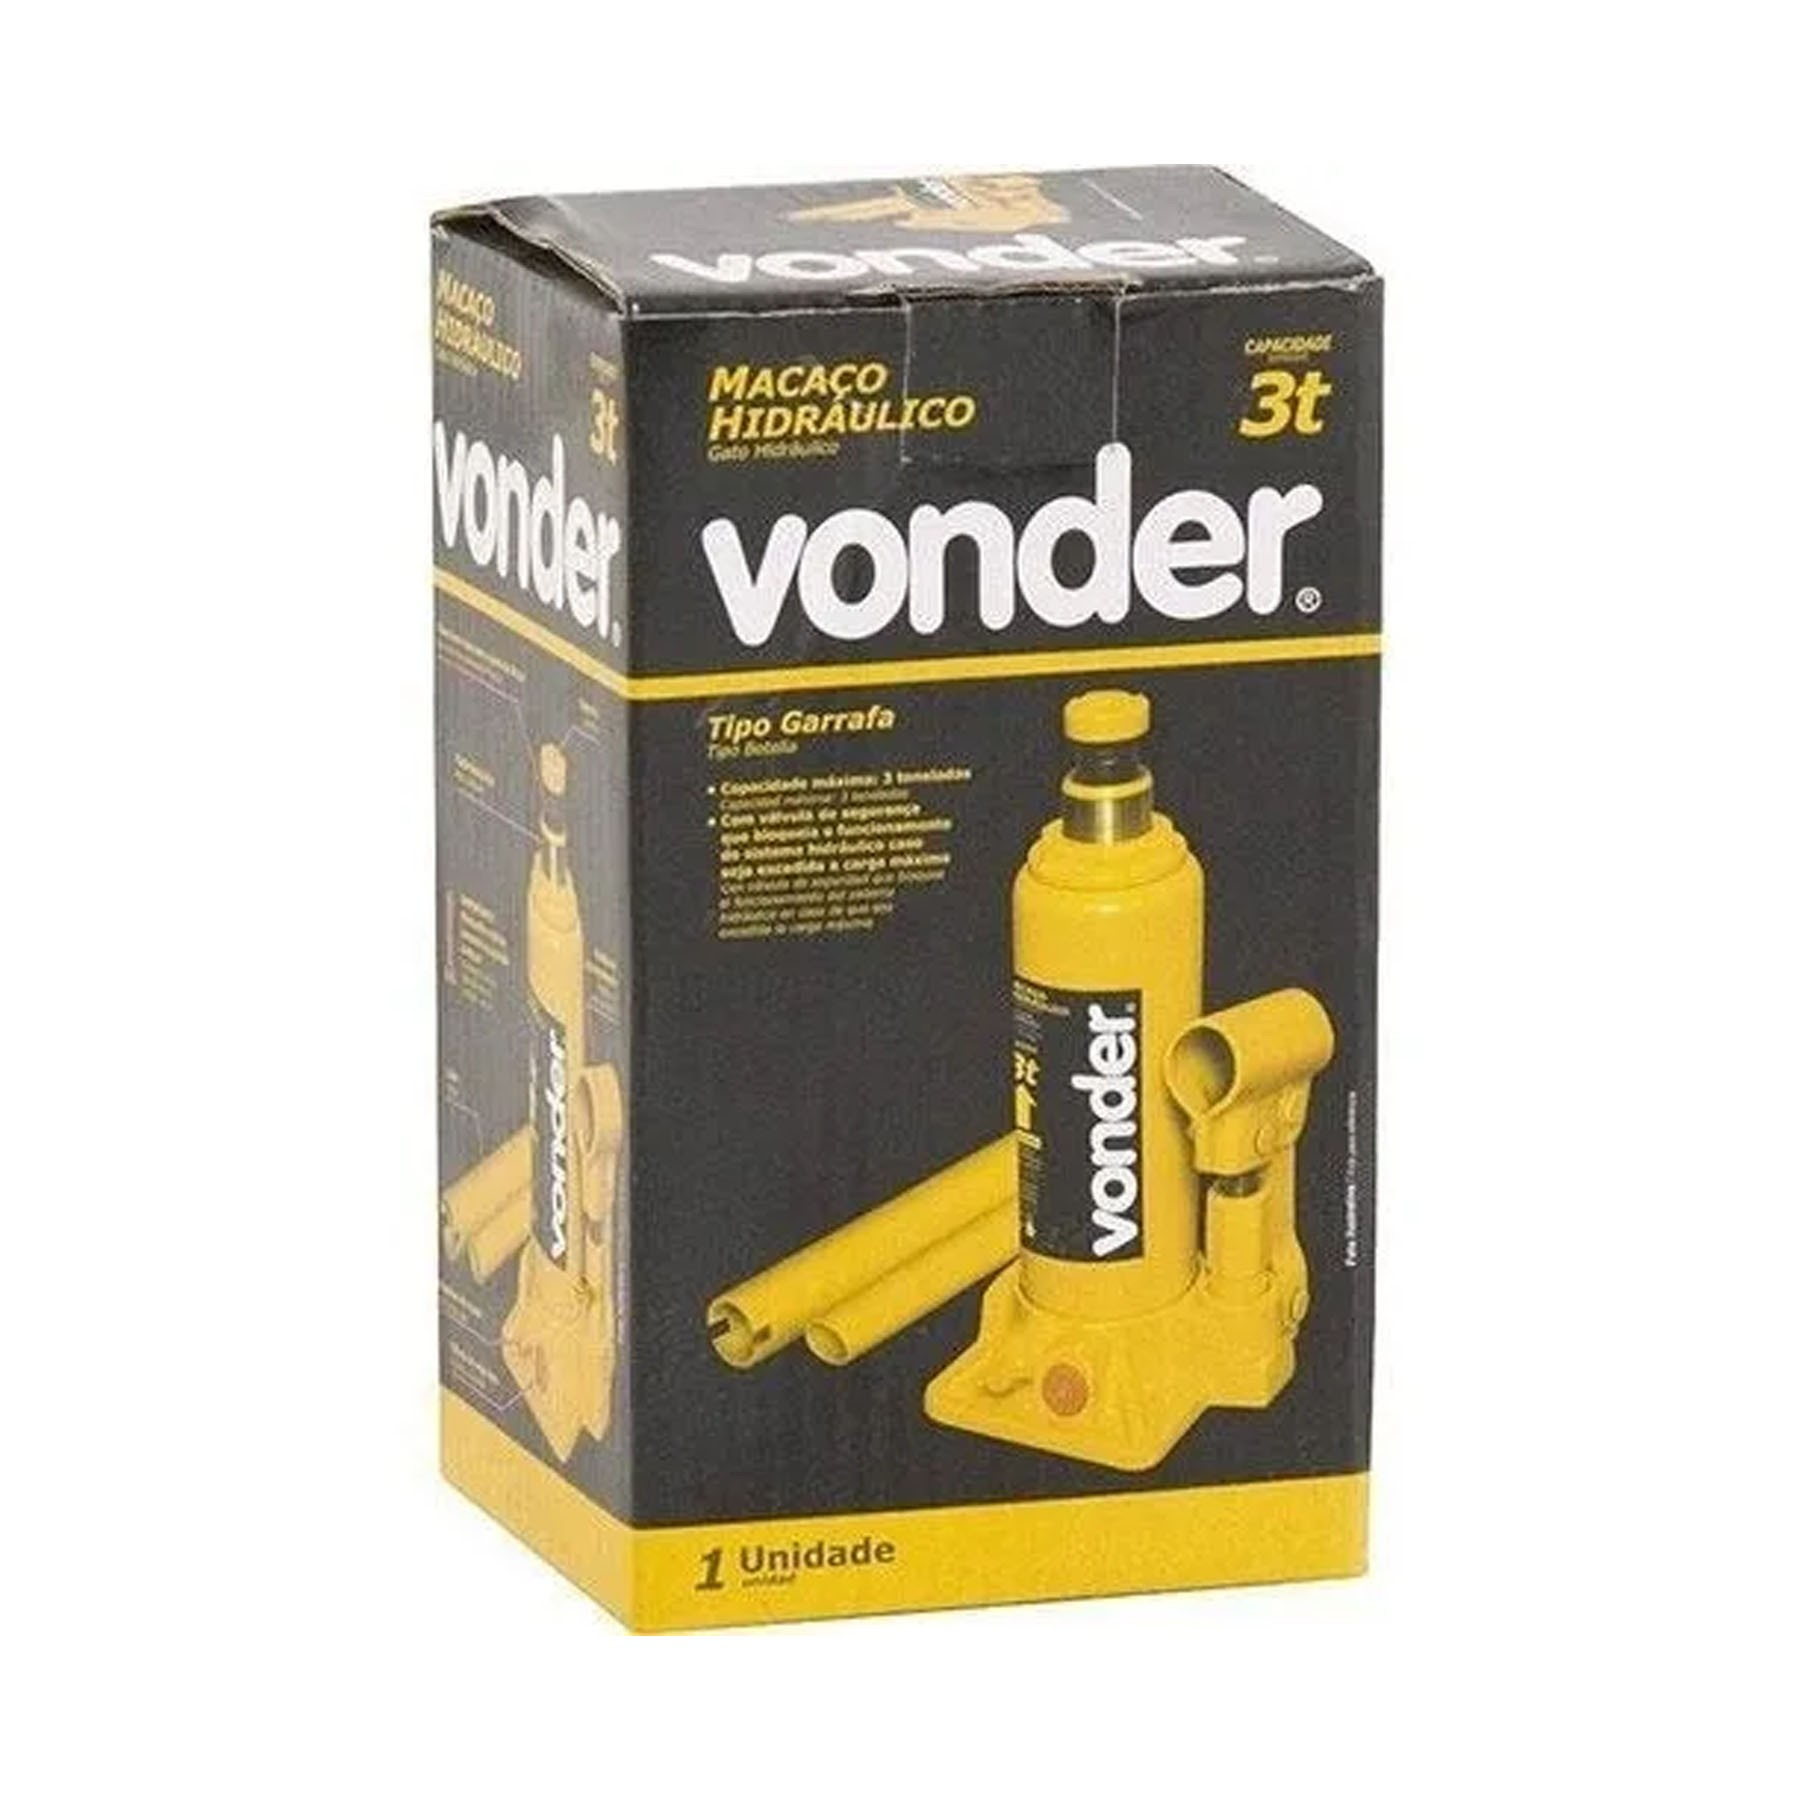 Macaco hidráulico tipo garrafa 3 toneladas VONDER